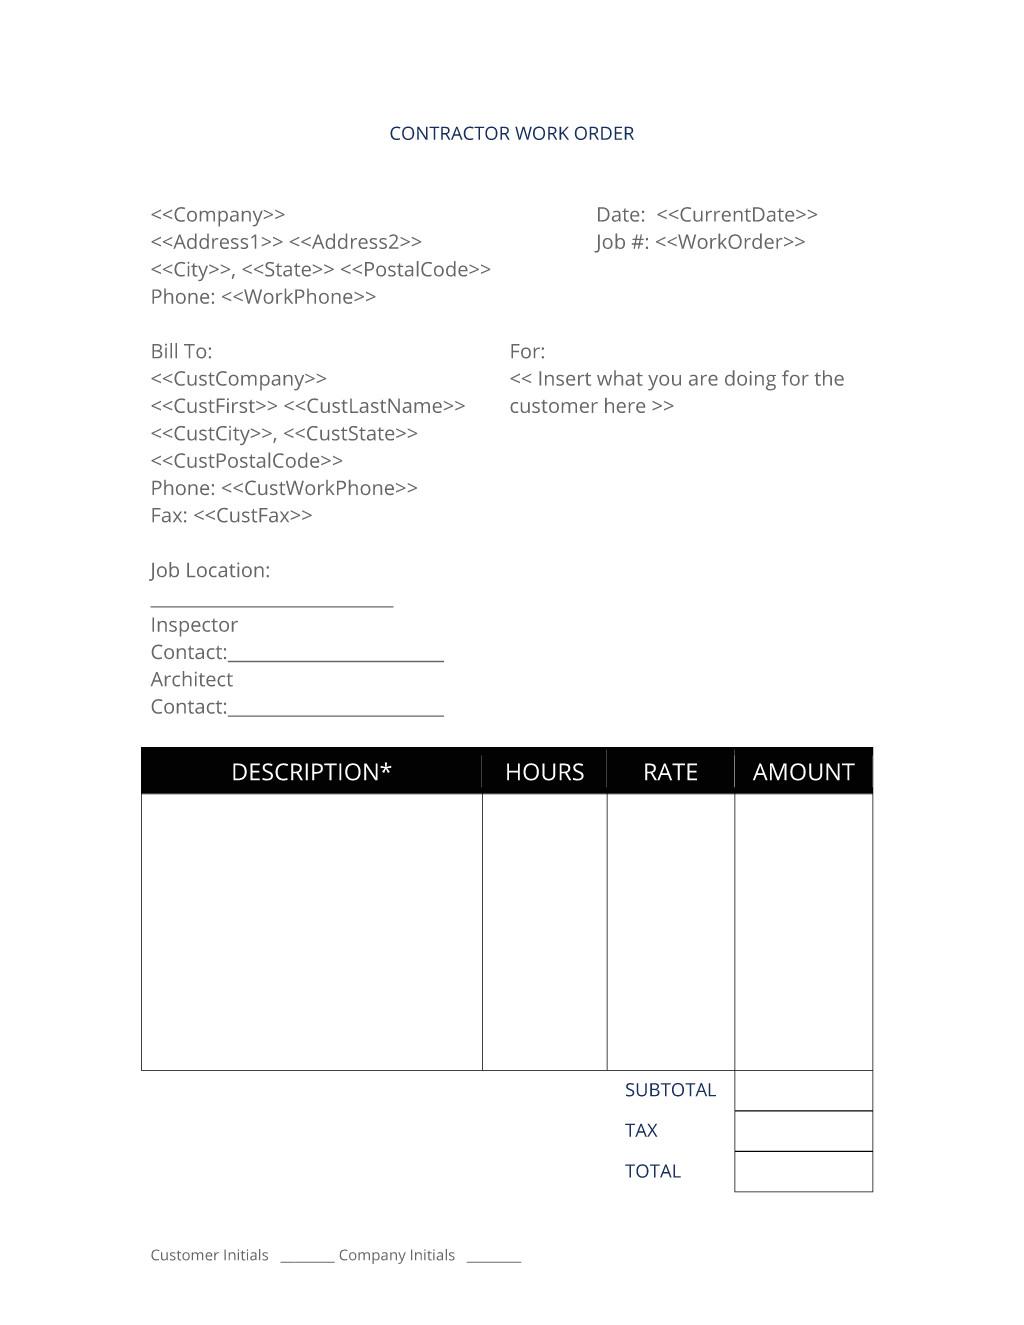 general contractor job work order contract agreement form